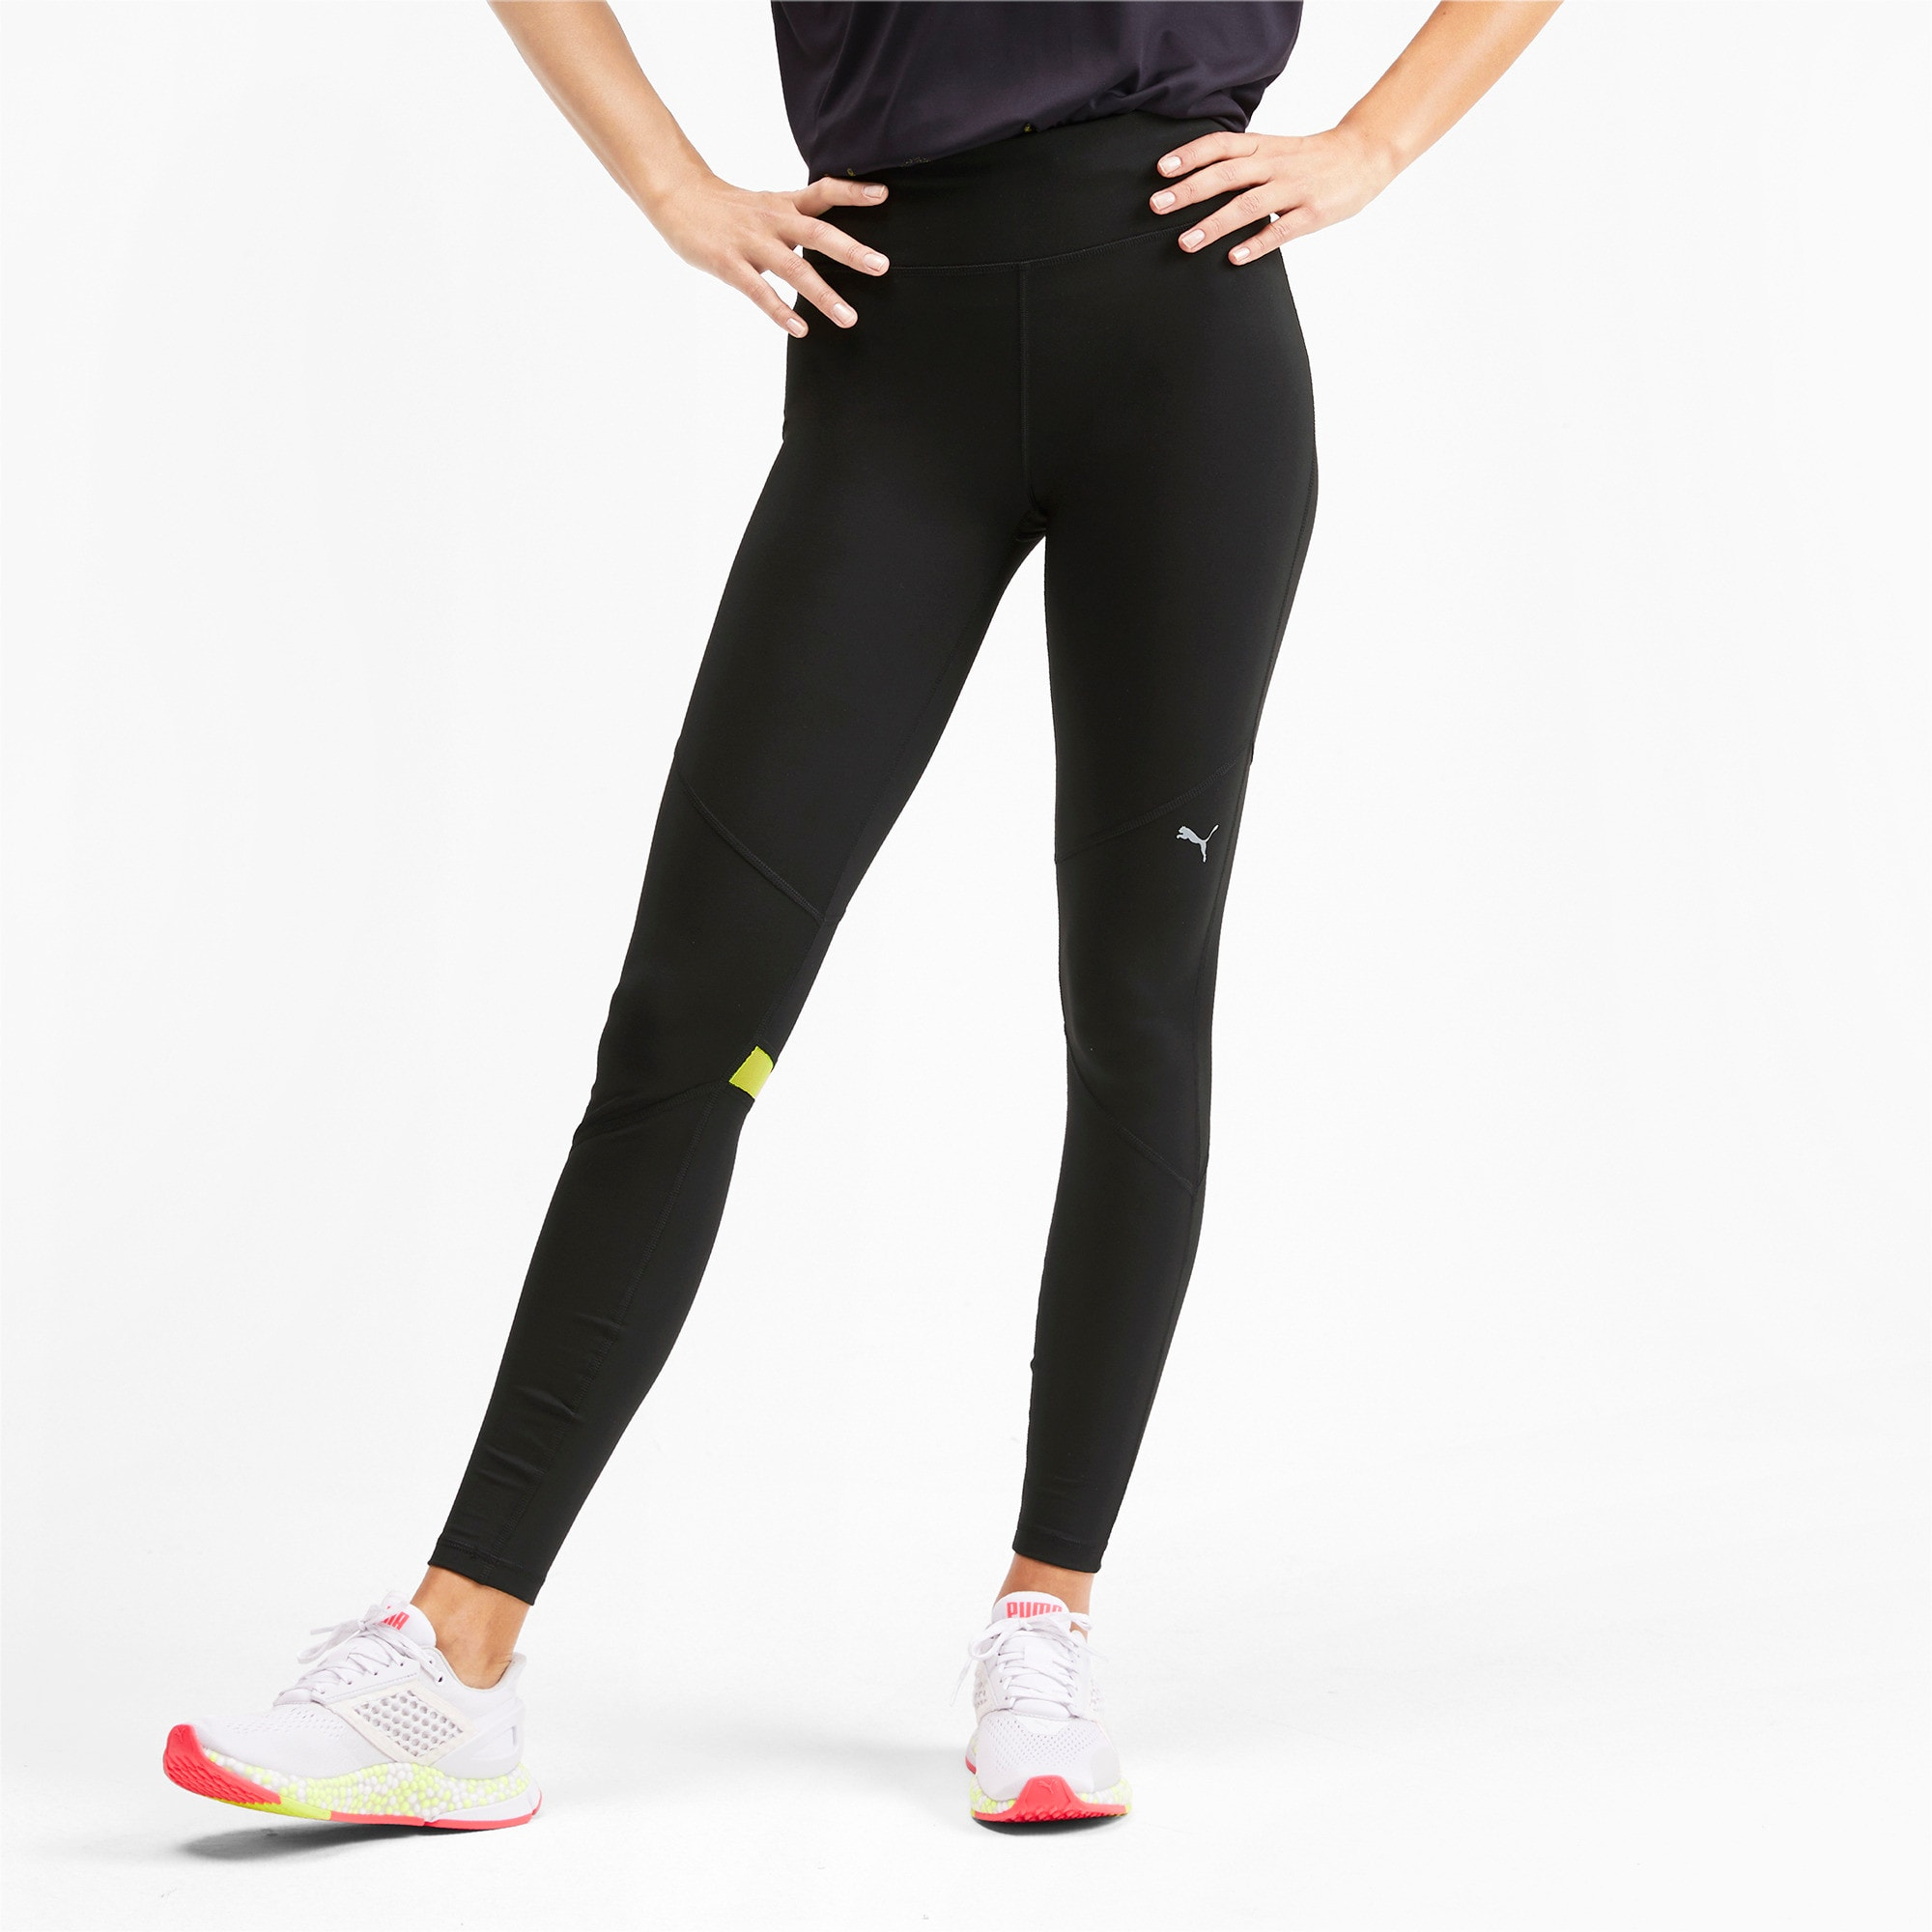 Miniatura 1 de Leggings largosIgnite para mujer, Puma Black-Yellow Alert, mediano